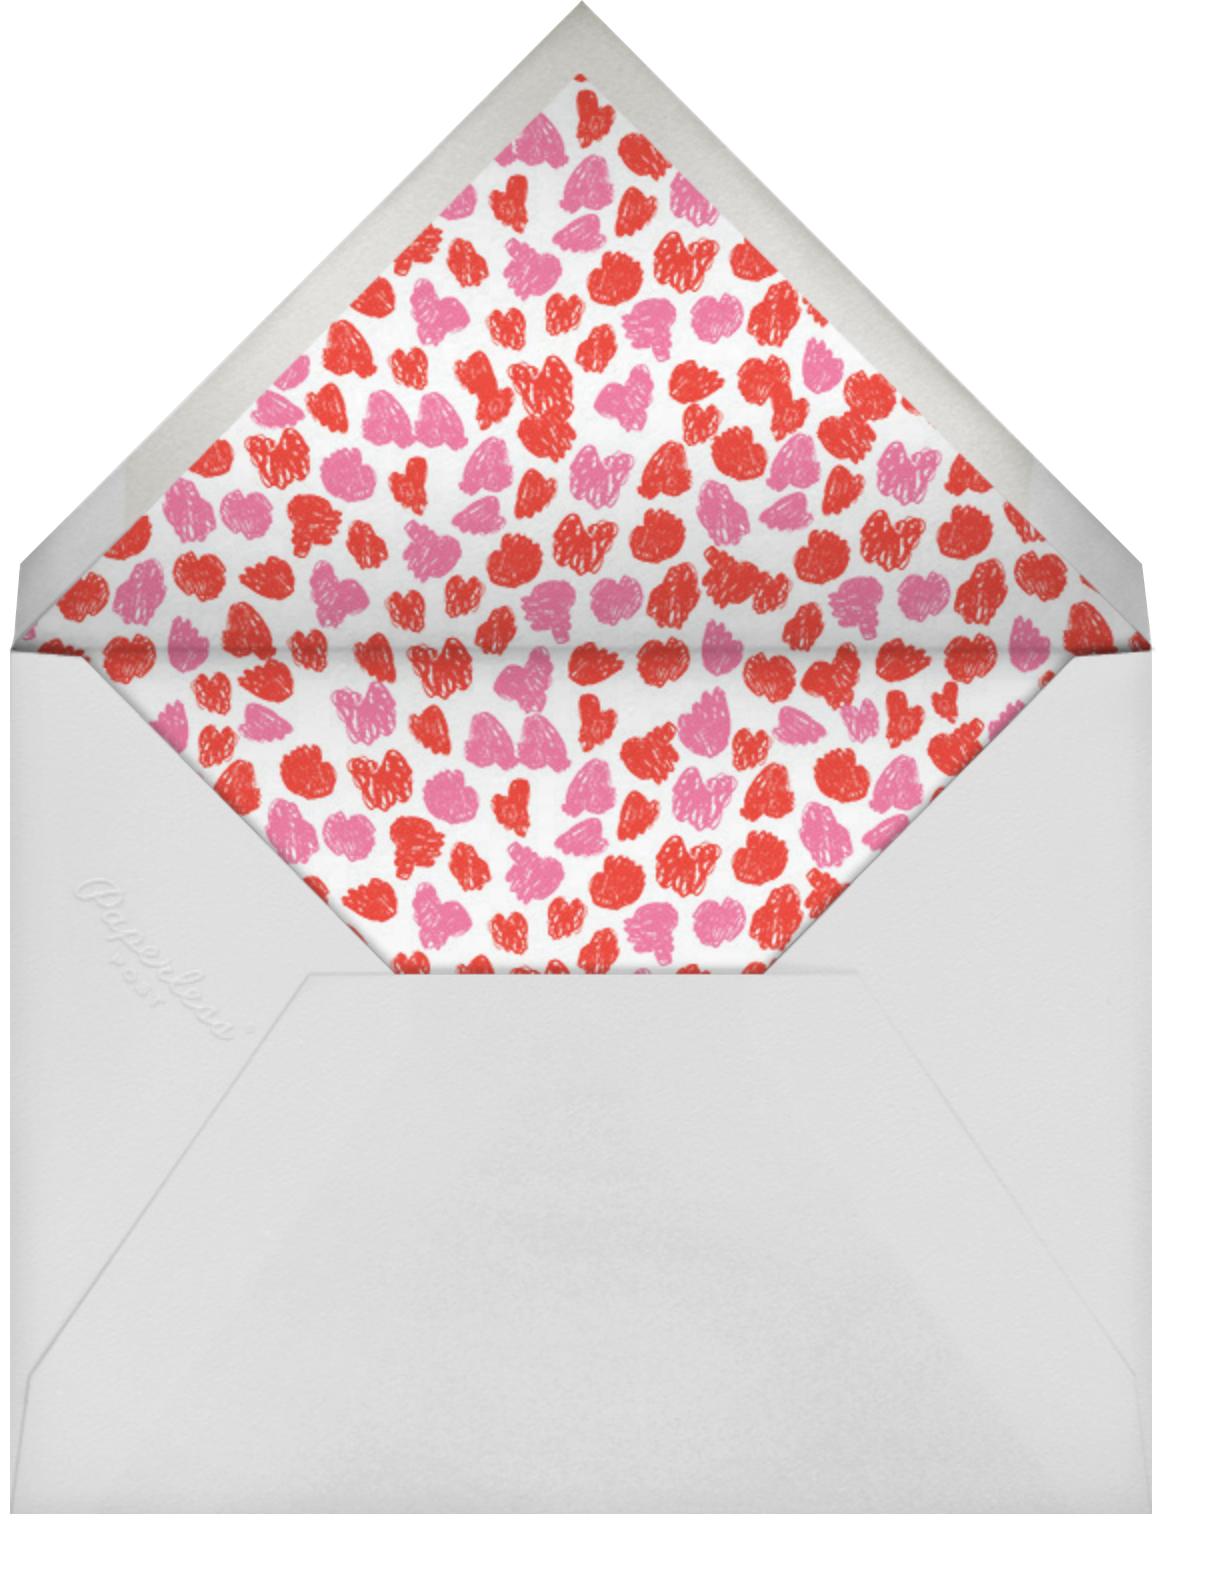 Glad You're Here - Sweet Pea - Mr. Boddington's Studio - Valentine's Day - envelope back